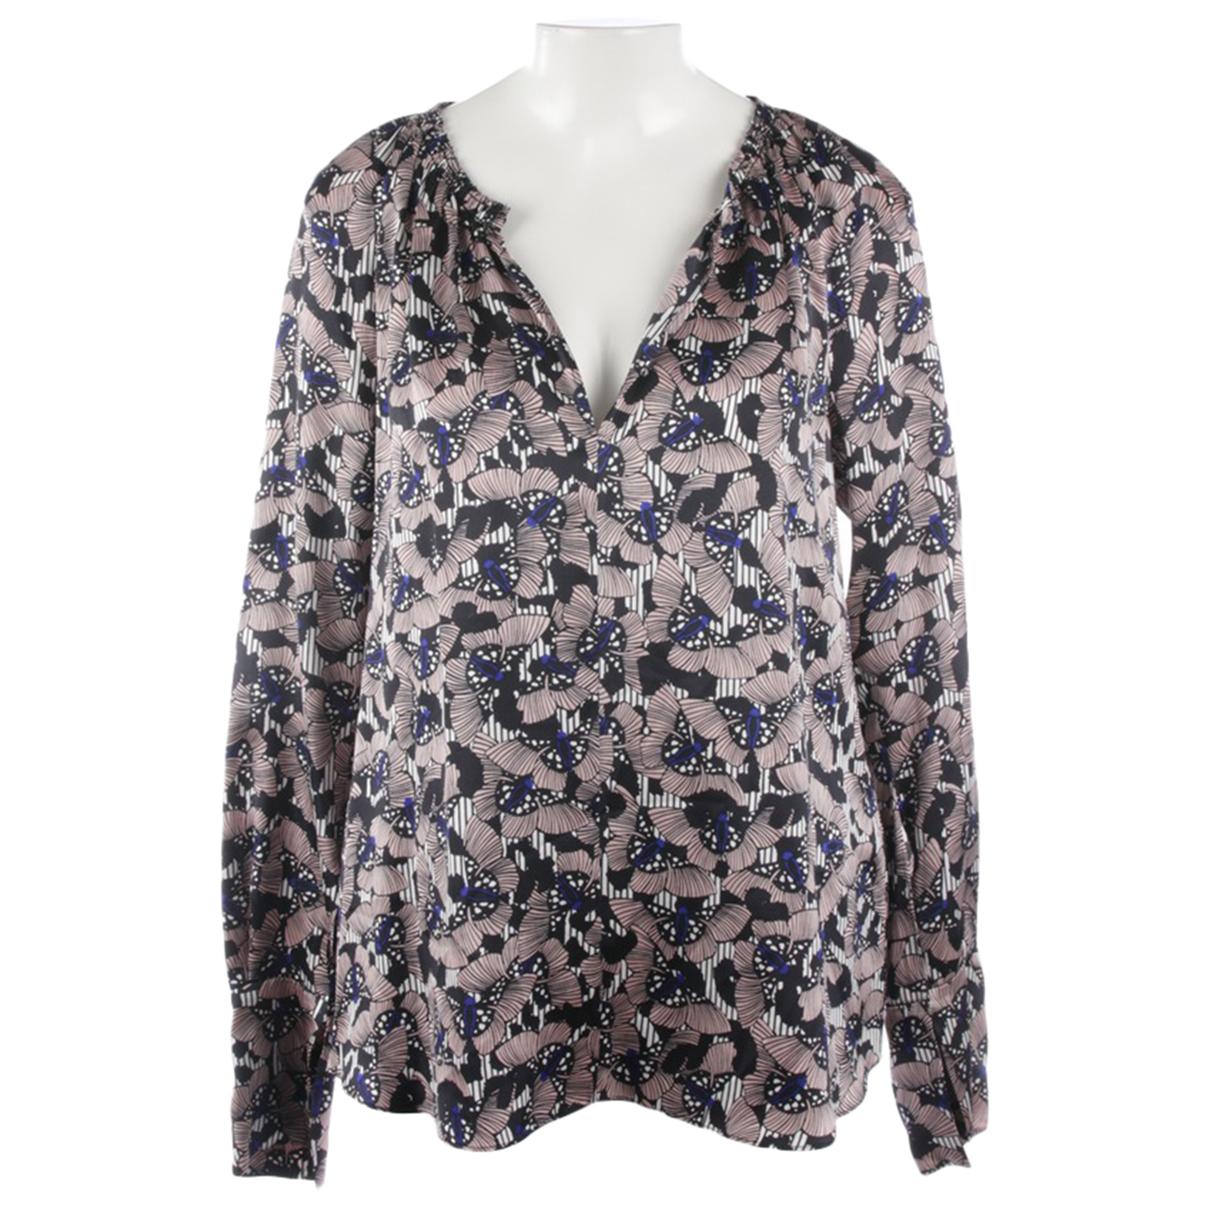 Dorothee Schumacher N Multicolour Silk  top for Women 38 IT